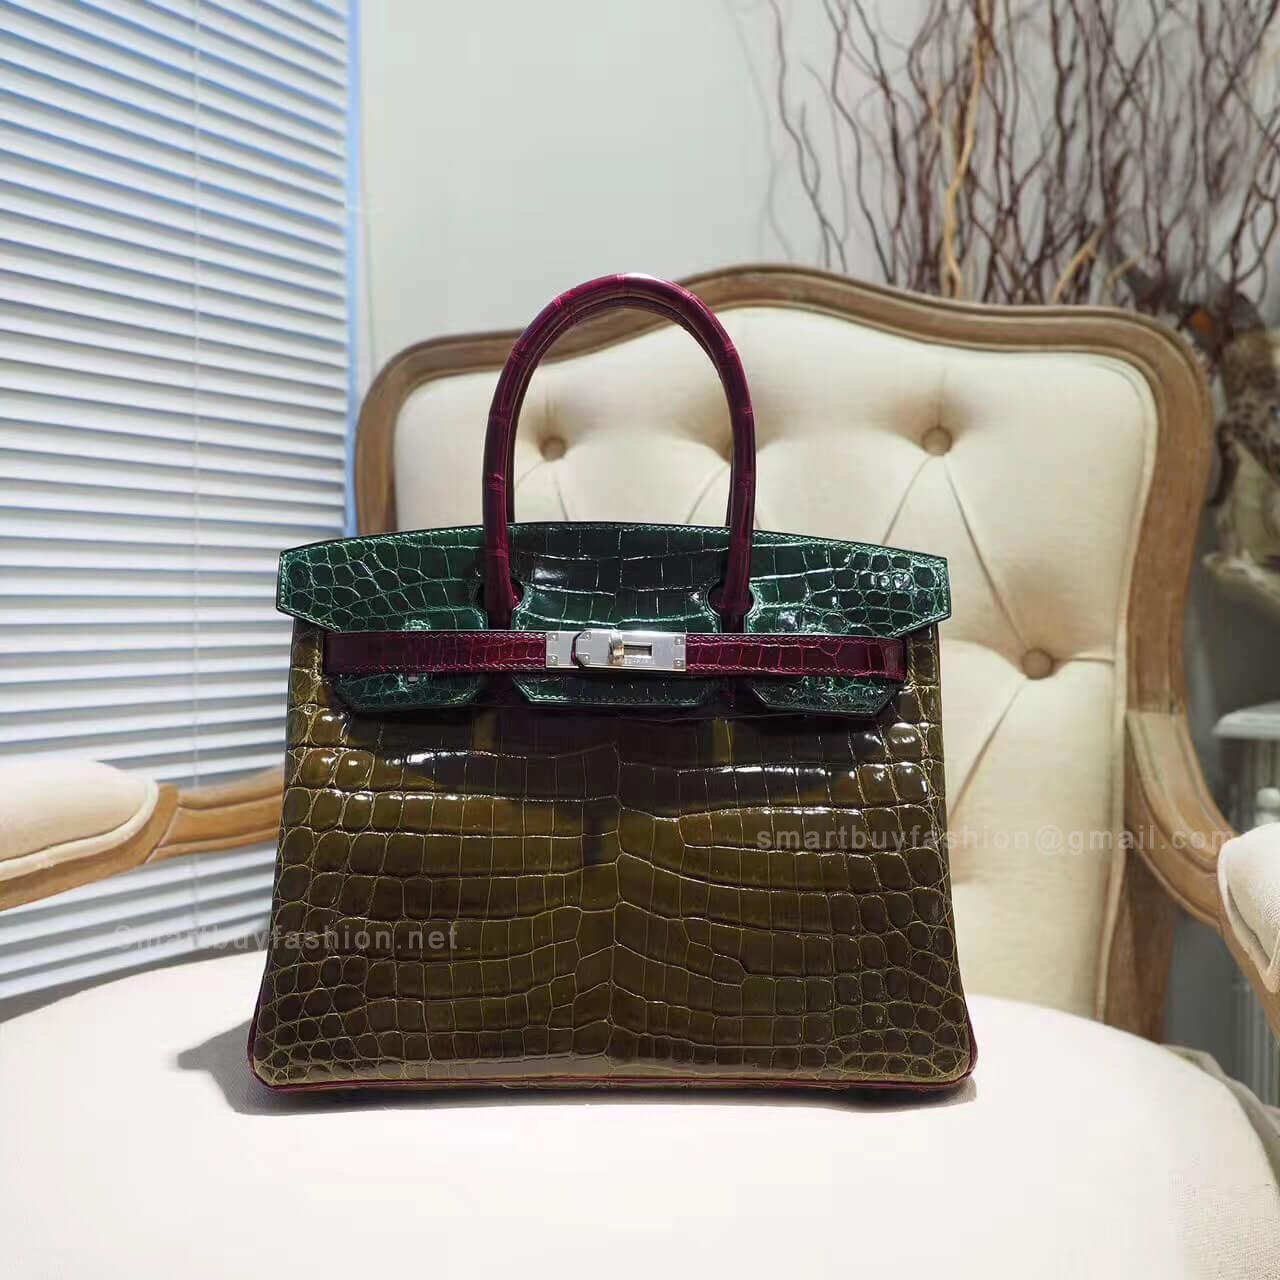 c4ddae1b6e58 Hermes Birkin 30 Bag in Tricolored Vert Fonce Shiny Nile Croc PHW